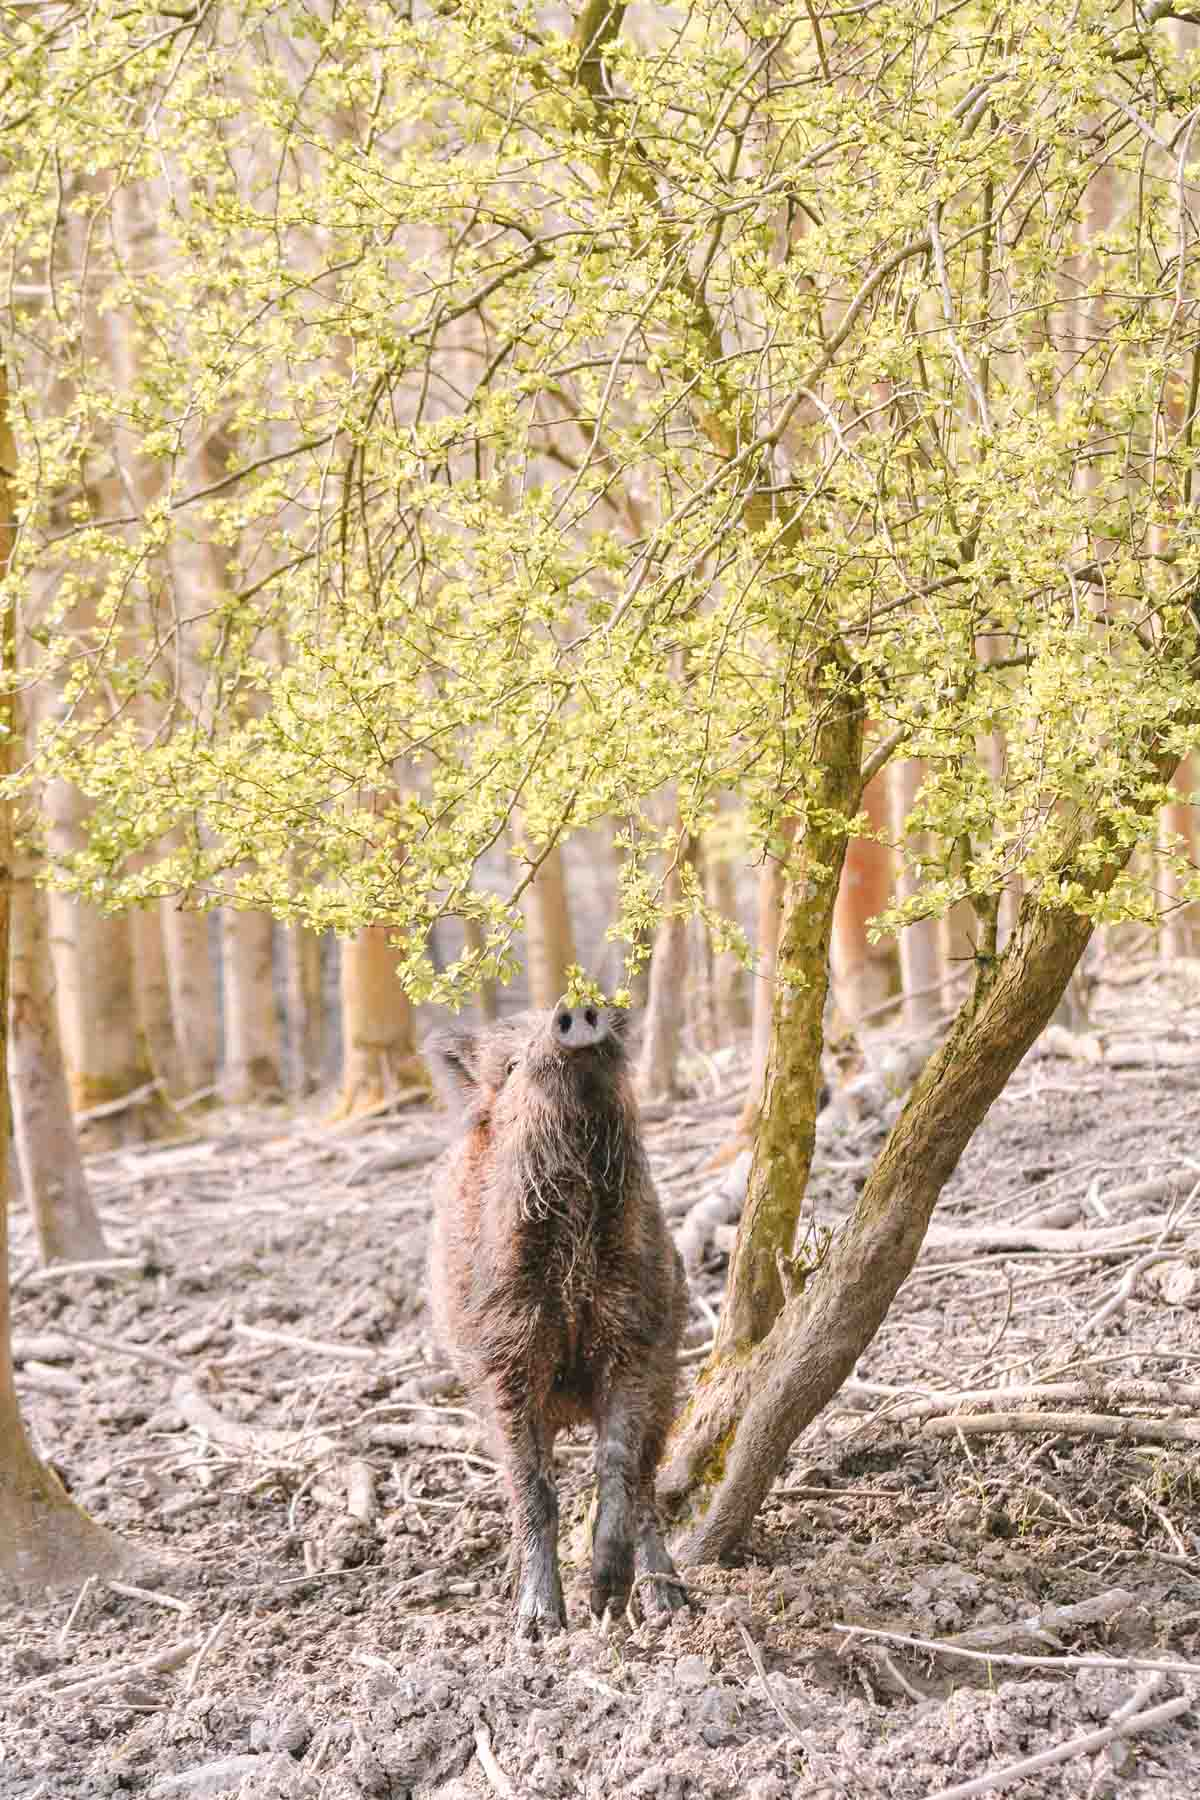 Safarigevoel in Nederland? Ga wandelen in Natuurpark Lelystad